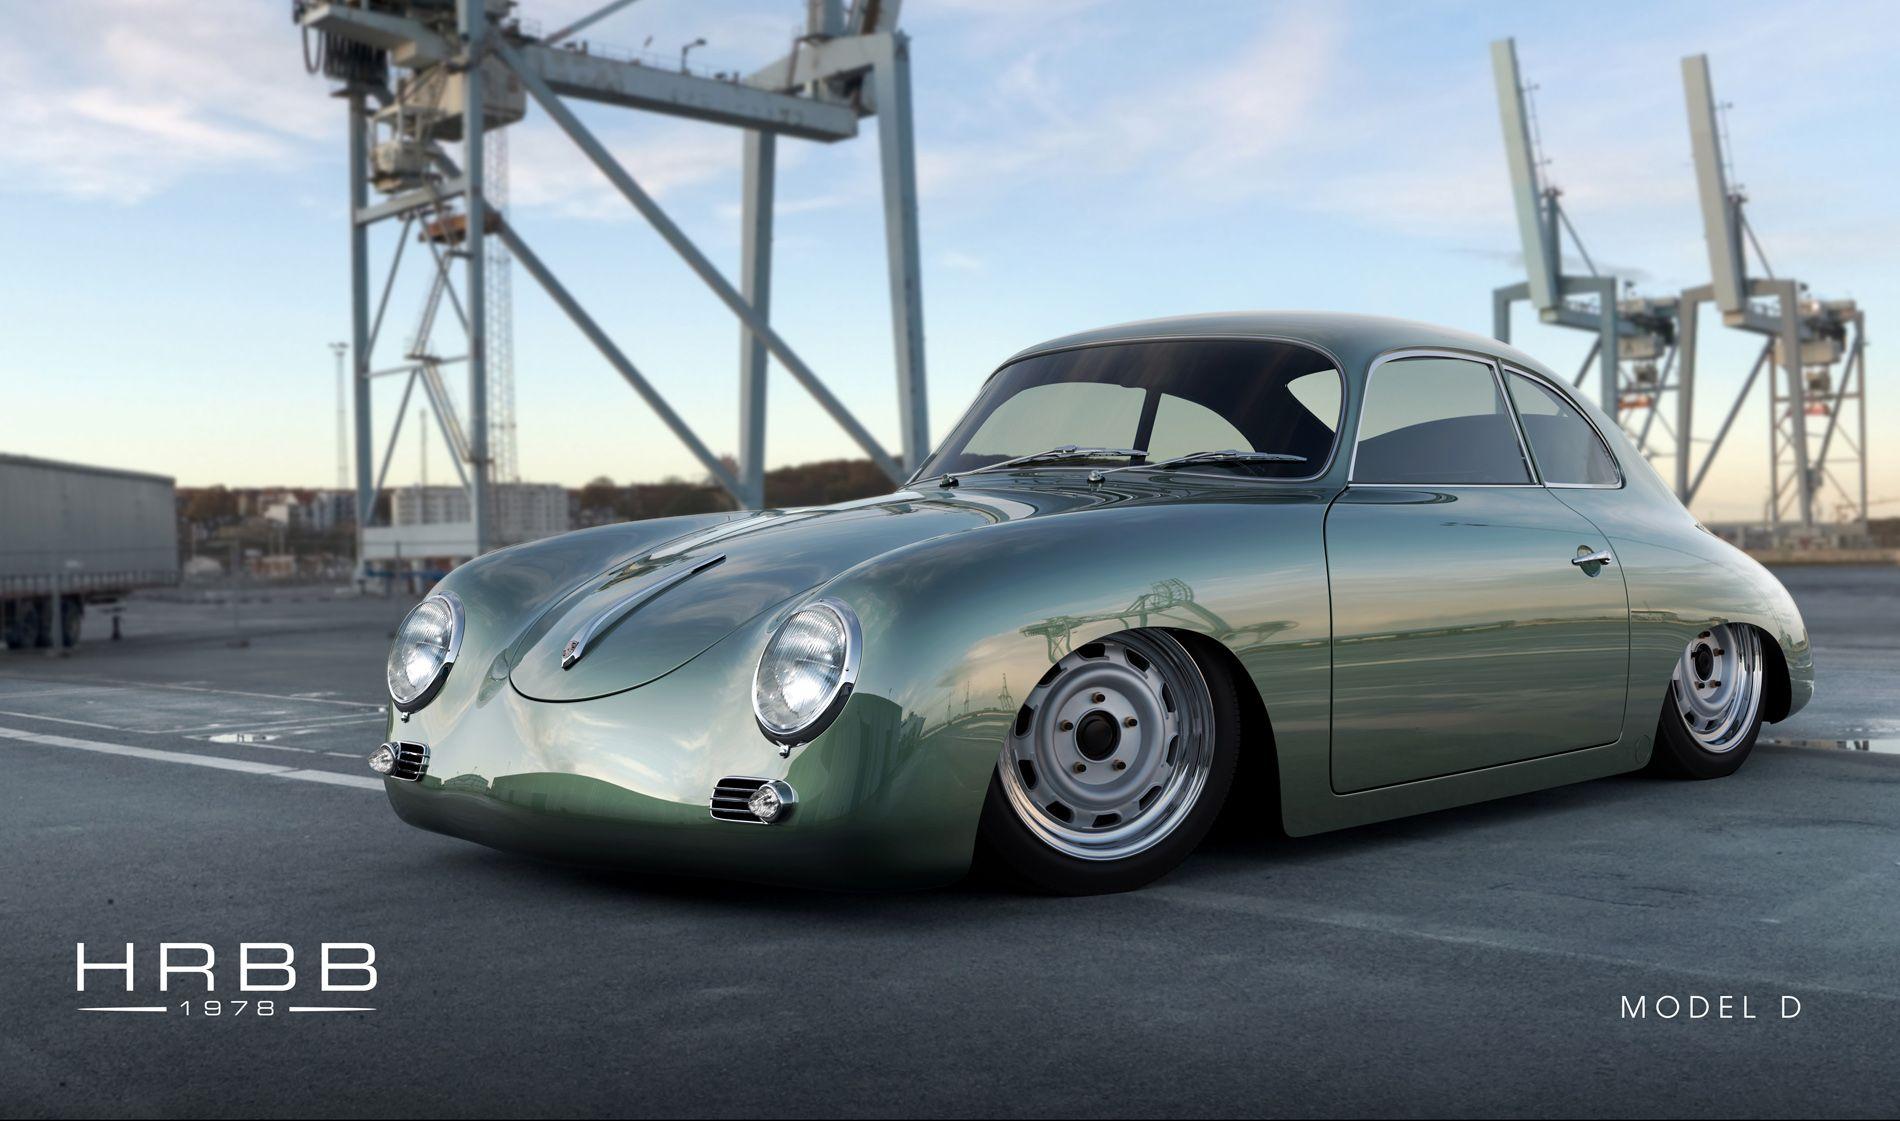 porsche 356 coupe - Google Search   best design   Pinterest ...